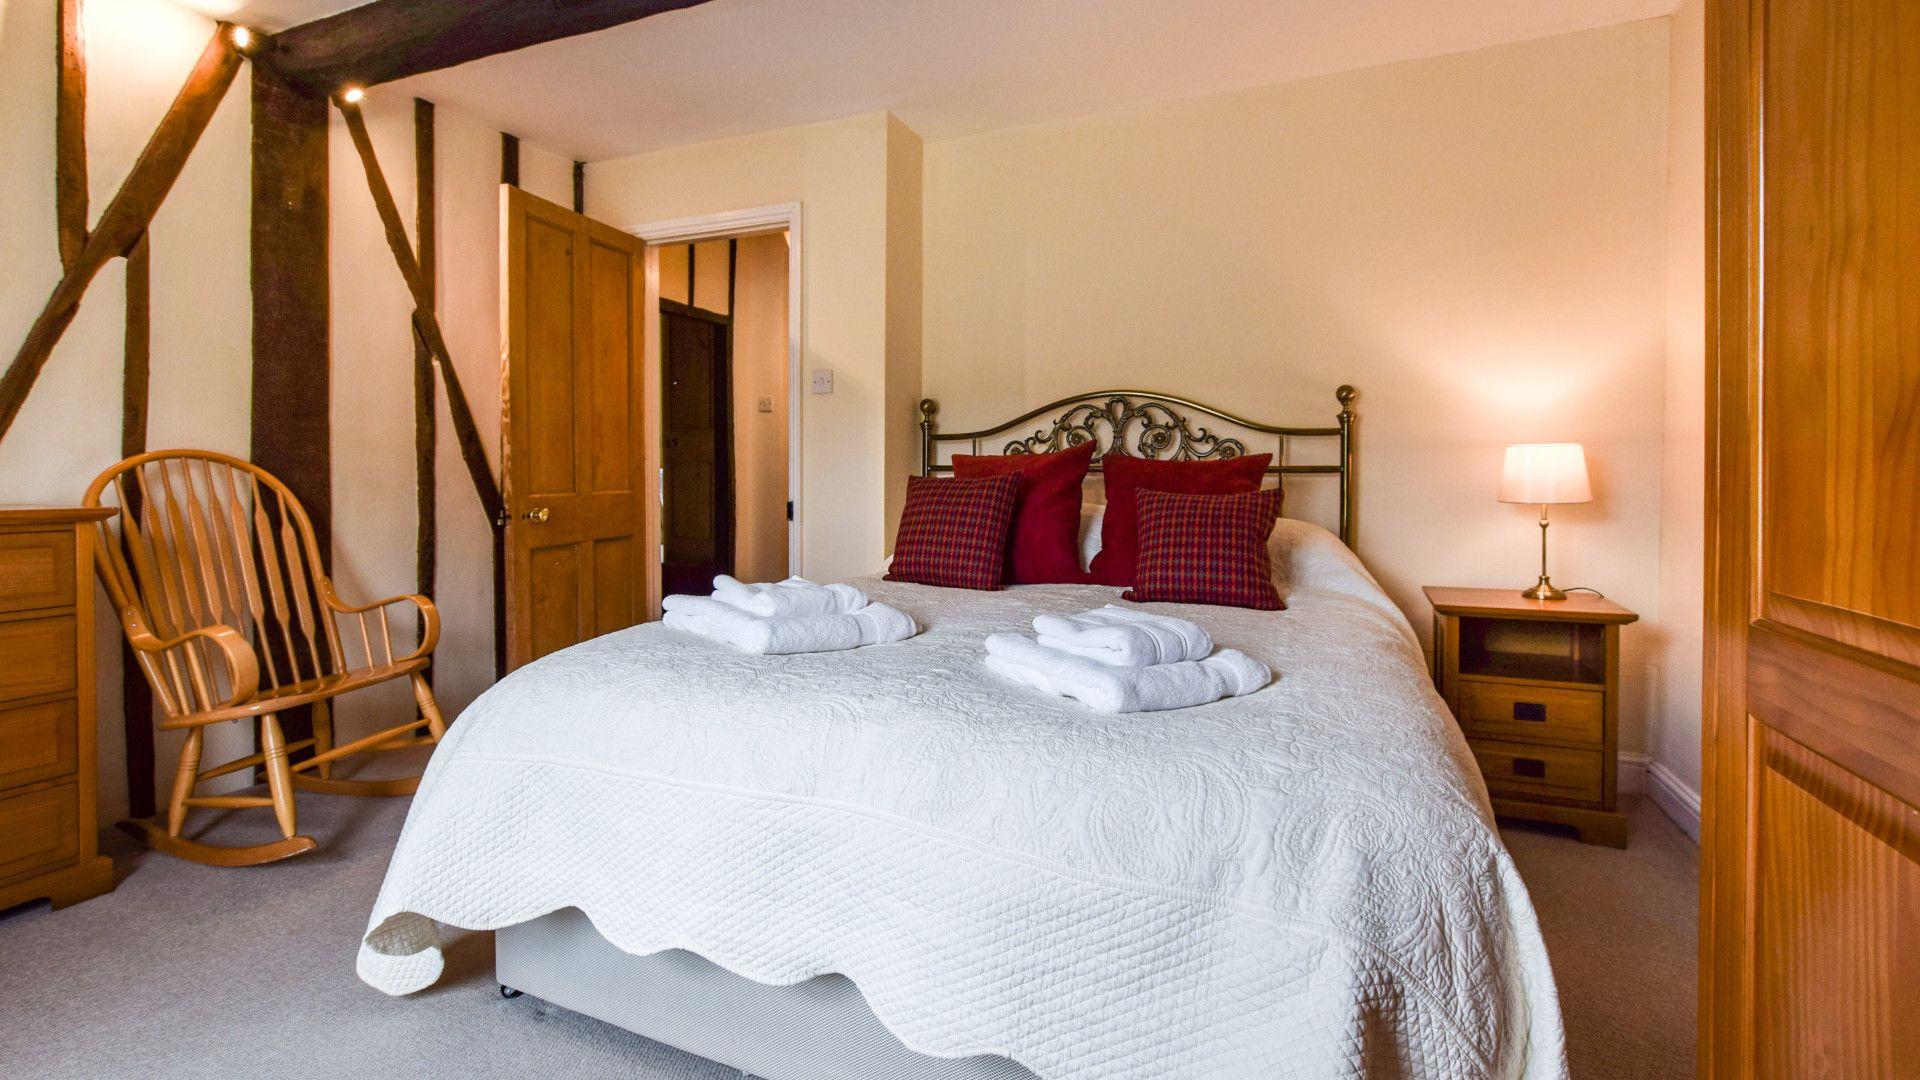 Bedroom 2, King-size, Barebones Farm, Bolthole Retreats